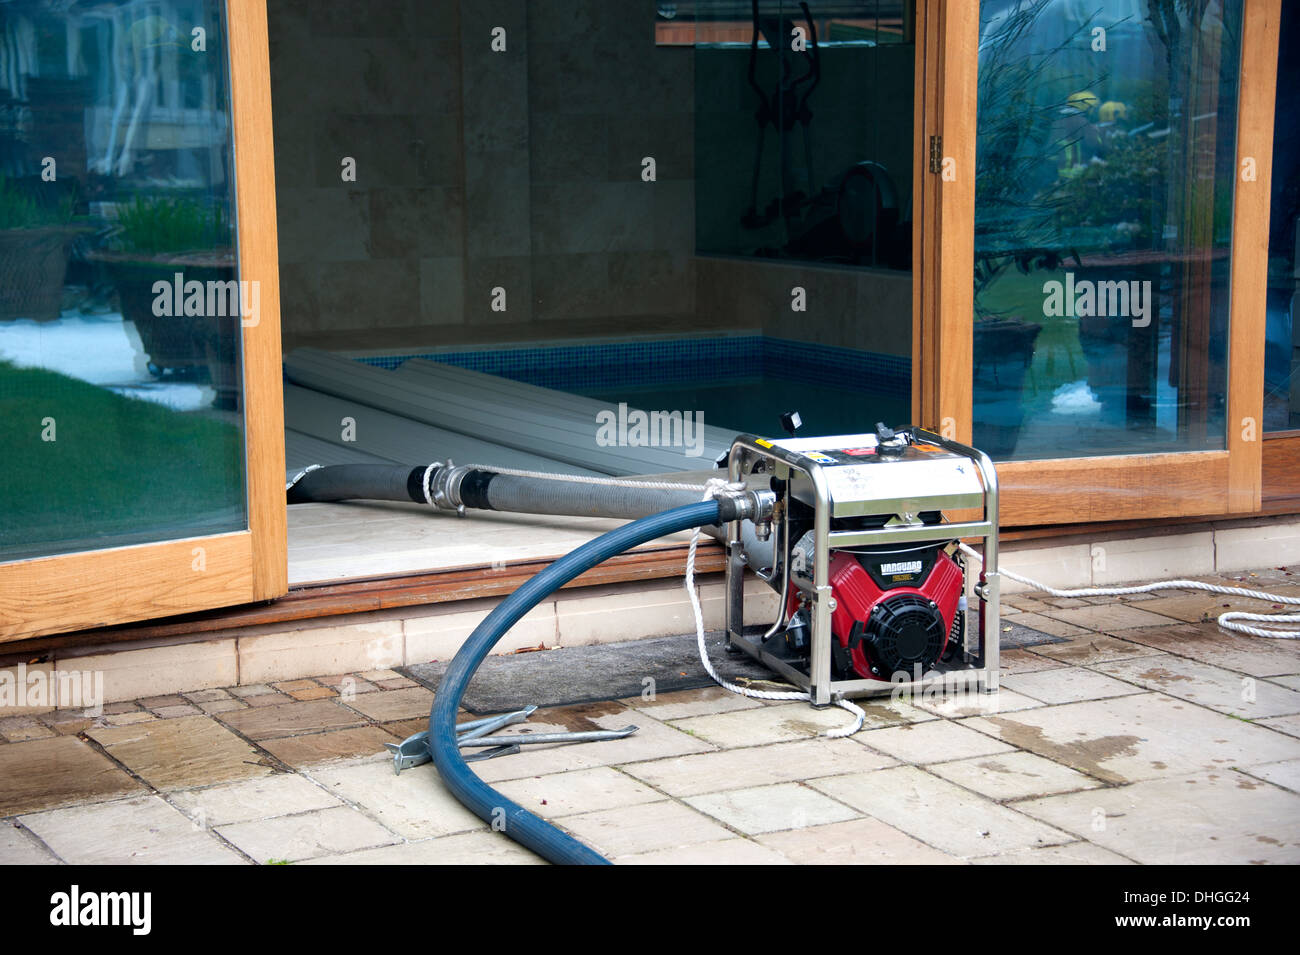 Water Pump Swimming Pool Stockfotos & Water Pump Swimming ...